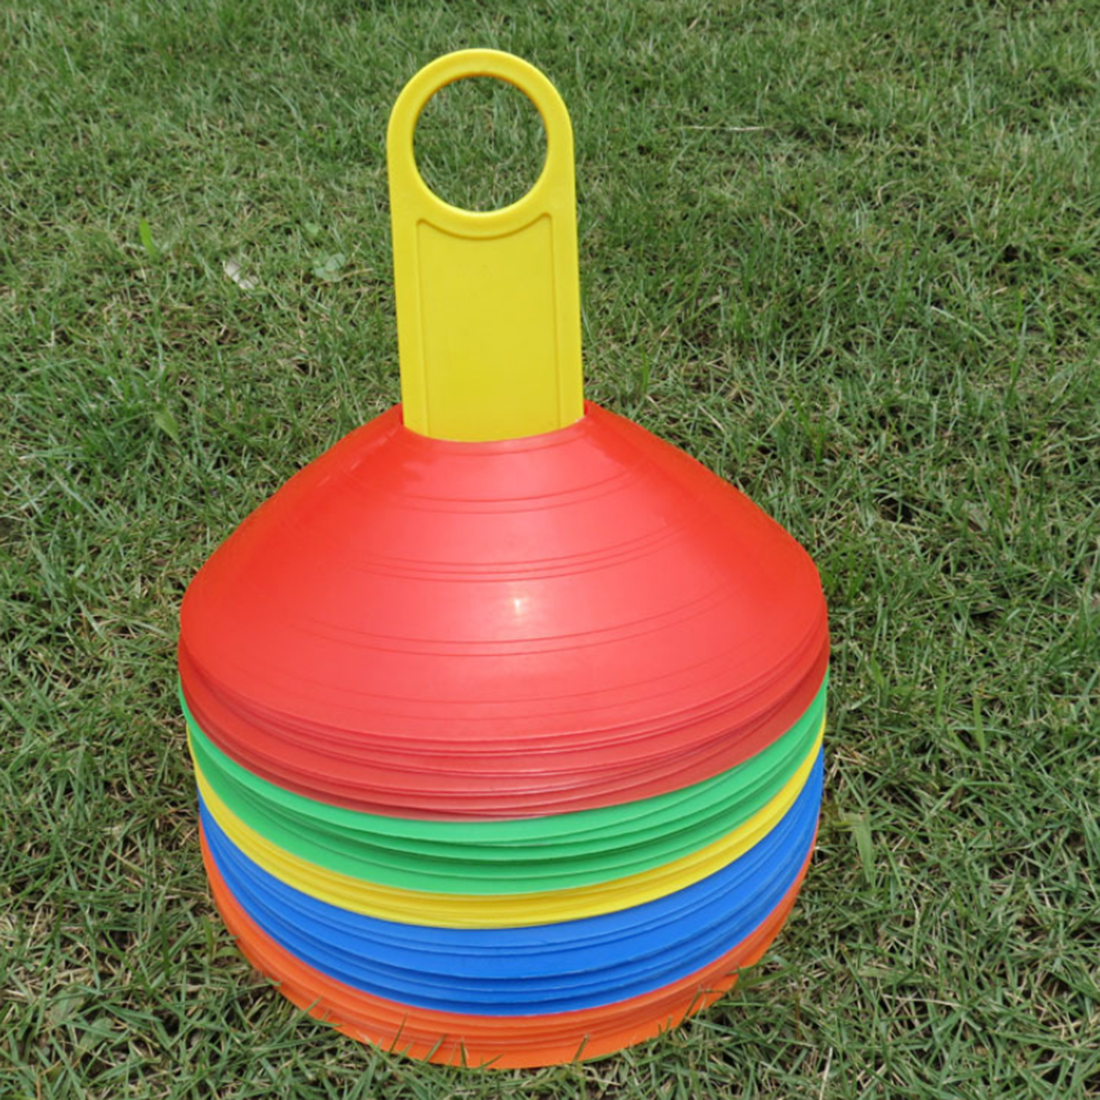 20Pcs Football Training Accessories Marker Discs Flexible Soccer Obstacle Cone Cross Roadblocks - Multicolor